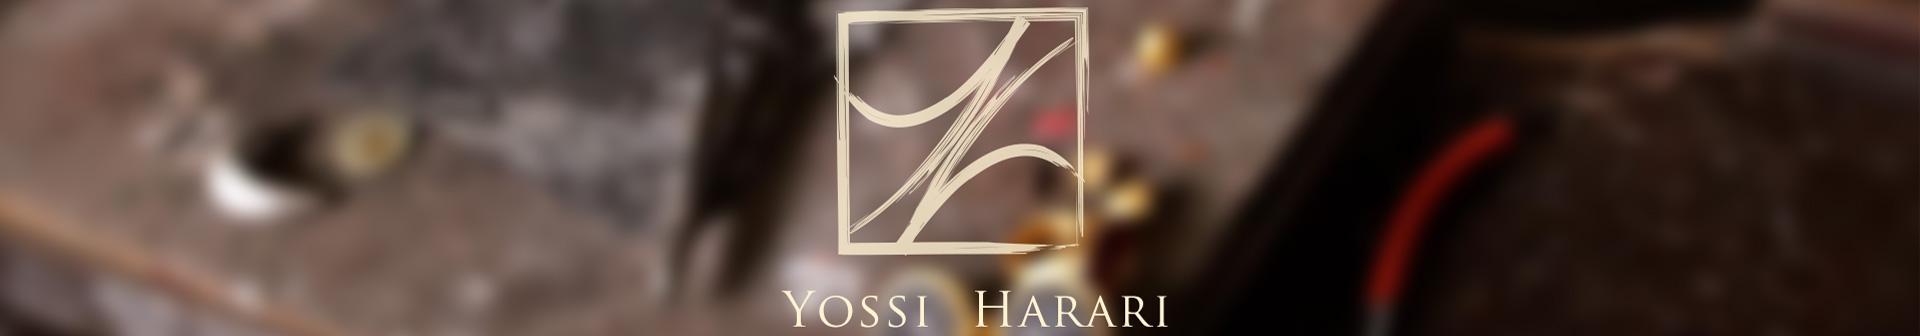 Cover yossi harari